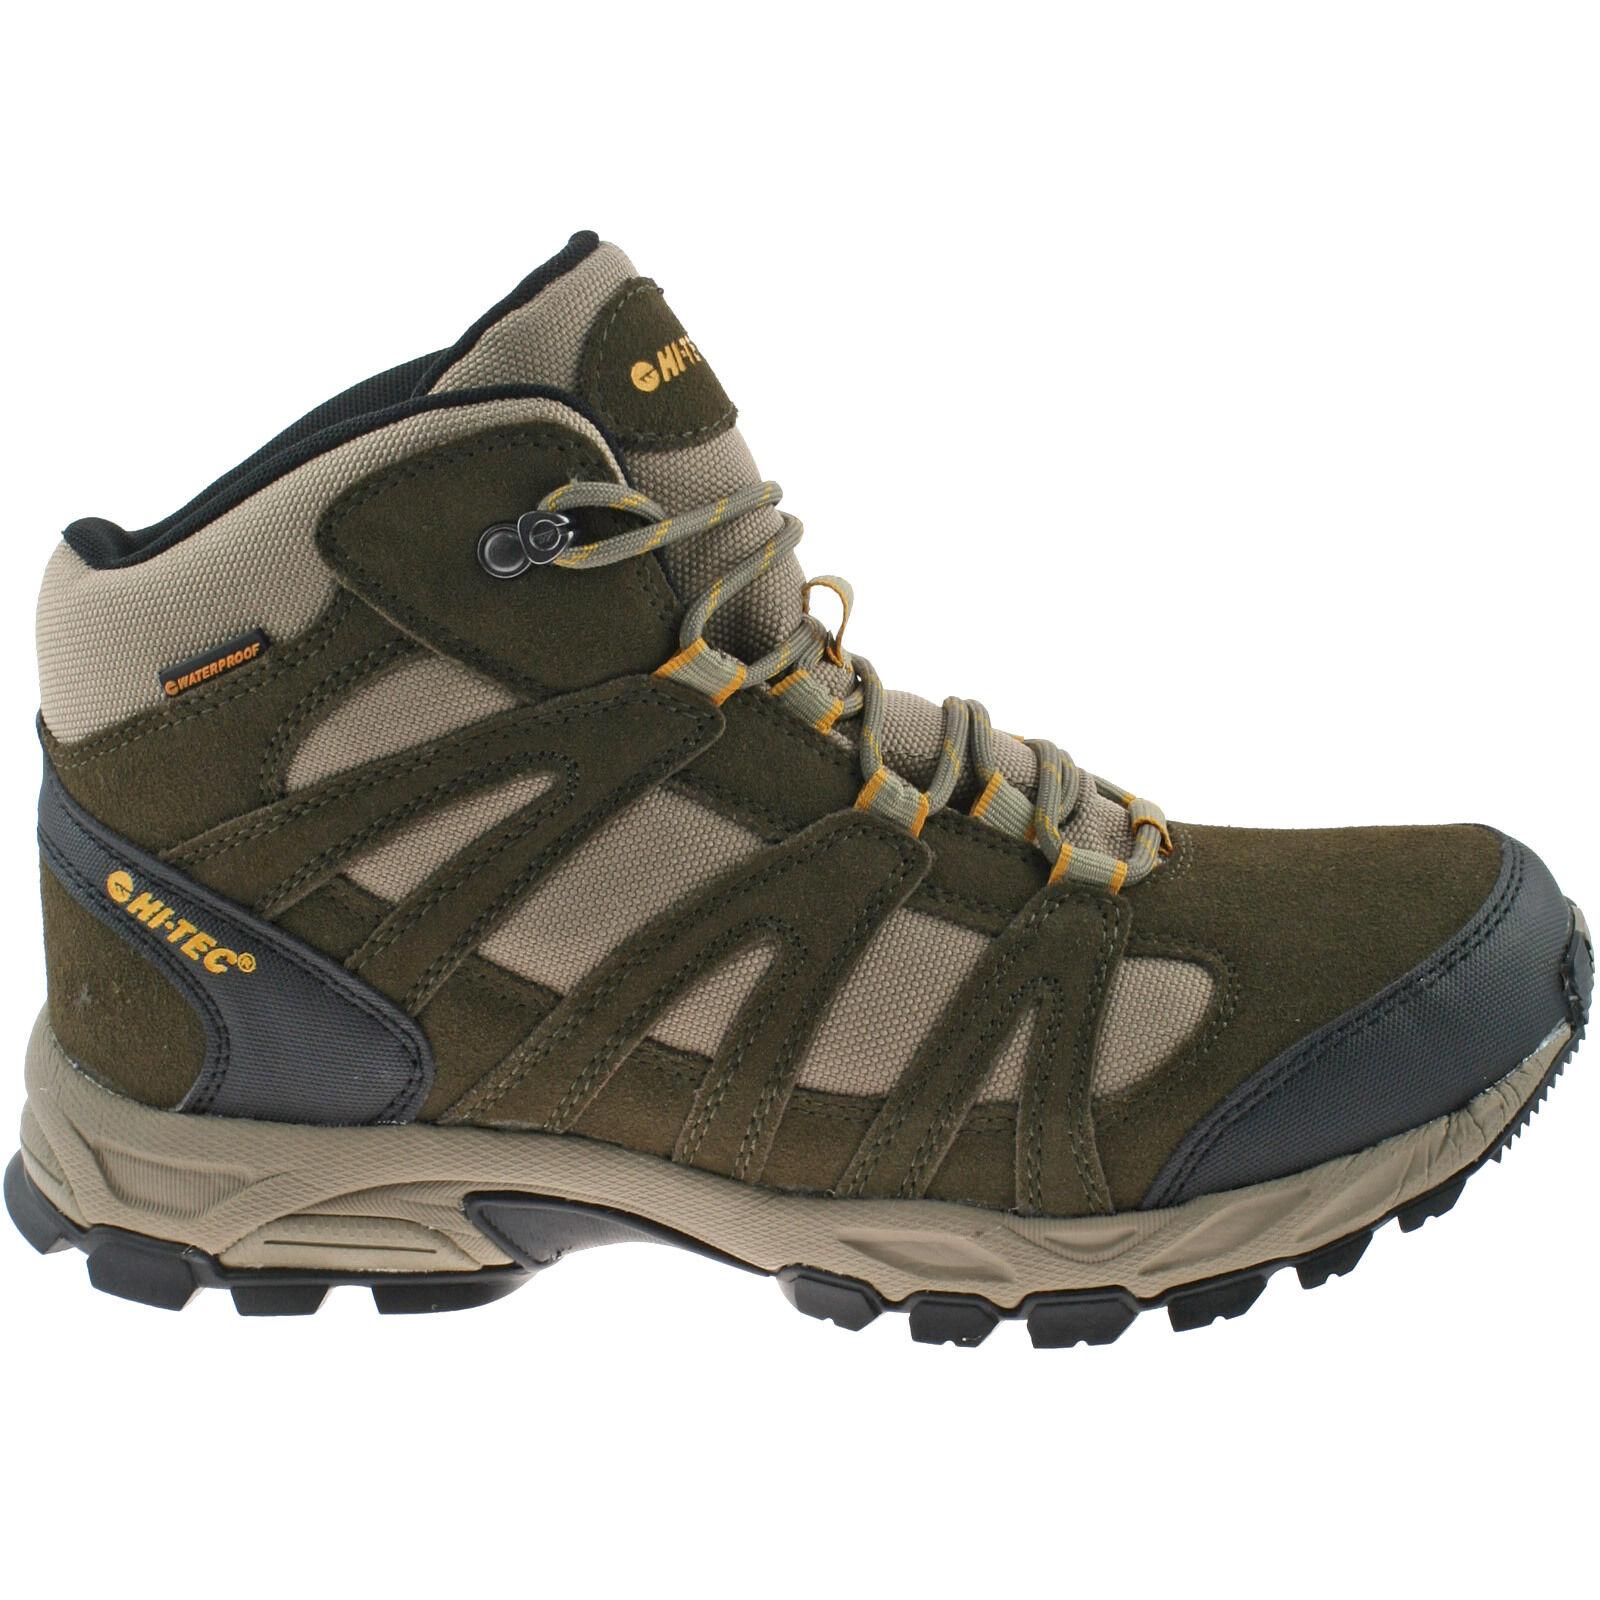 Uomo Hi-Tec Impermeabili Scarpe da Trekking Impermeabili Hi-Tec Taglia Passeggio Camoscio 3b92d8